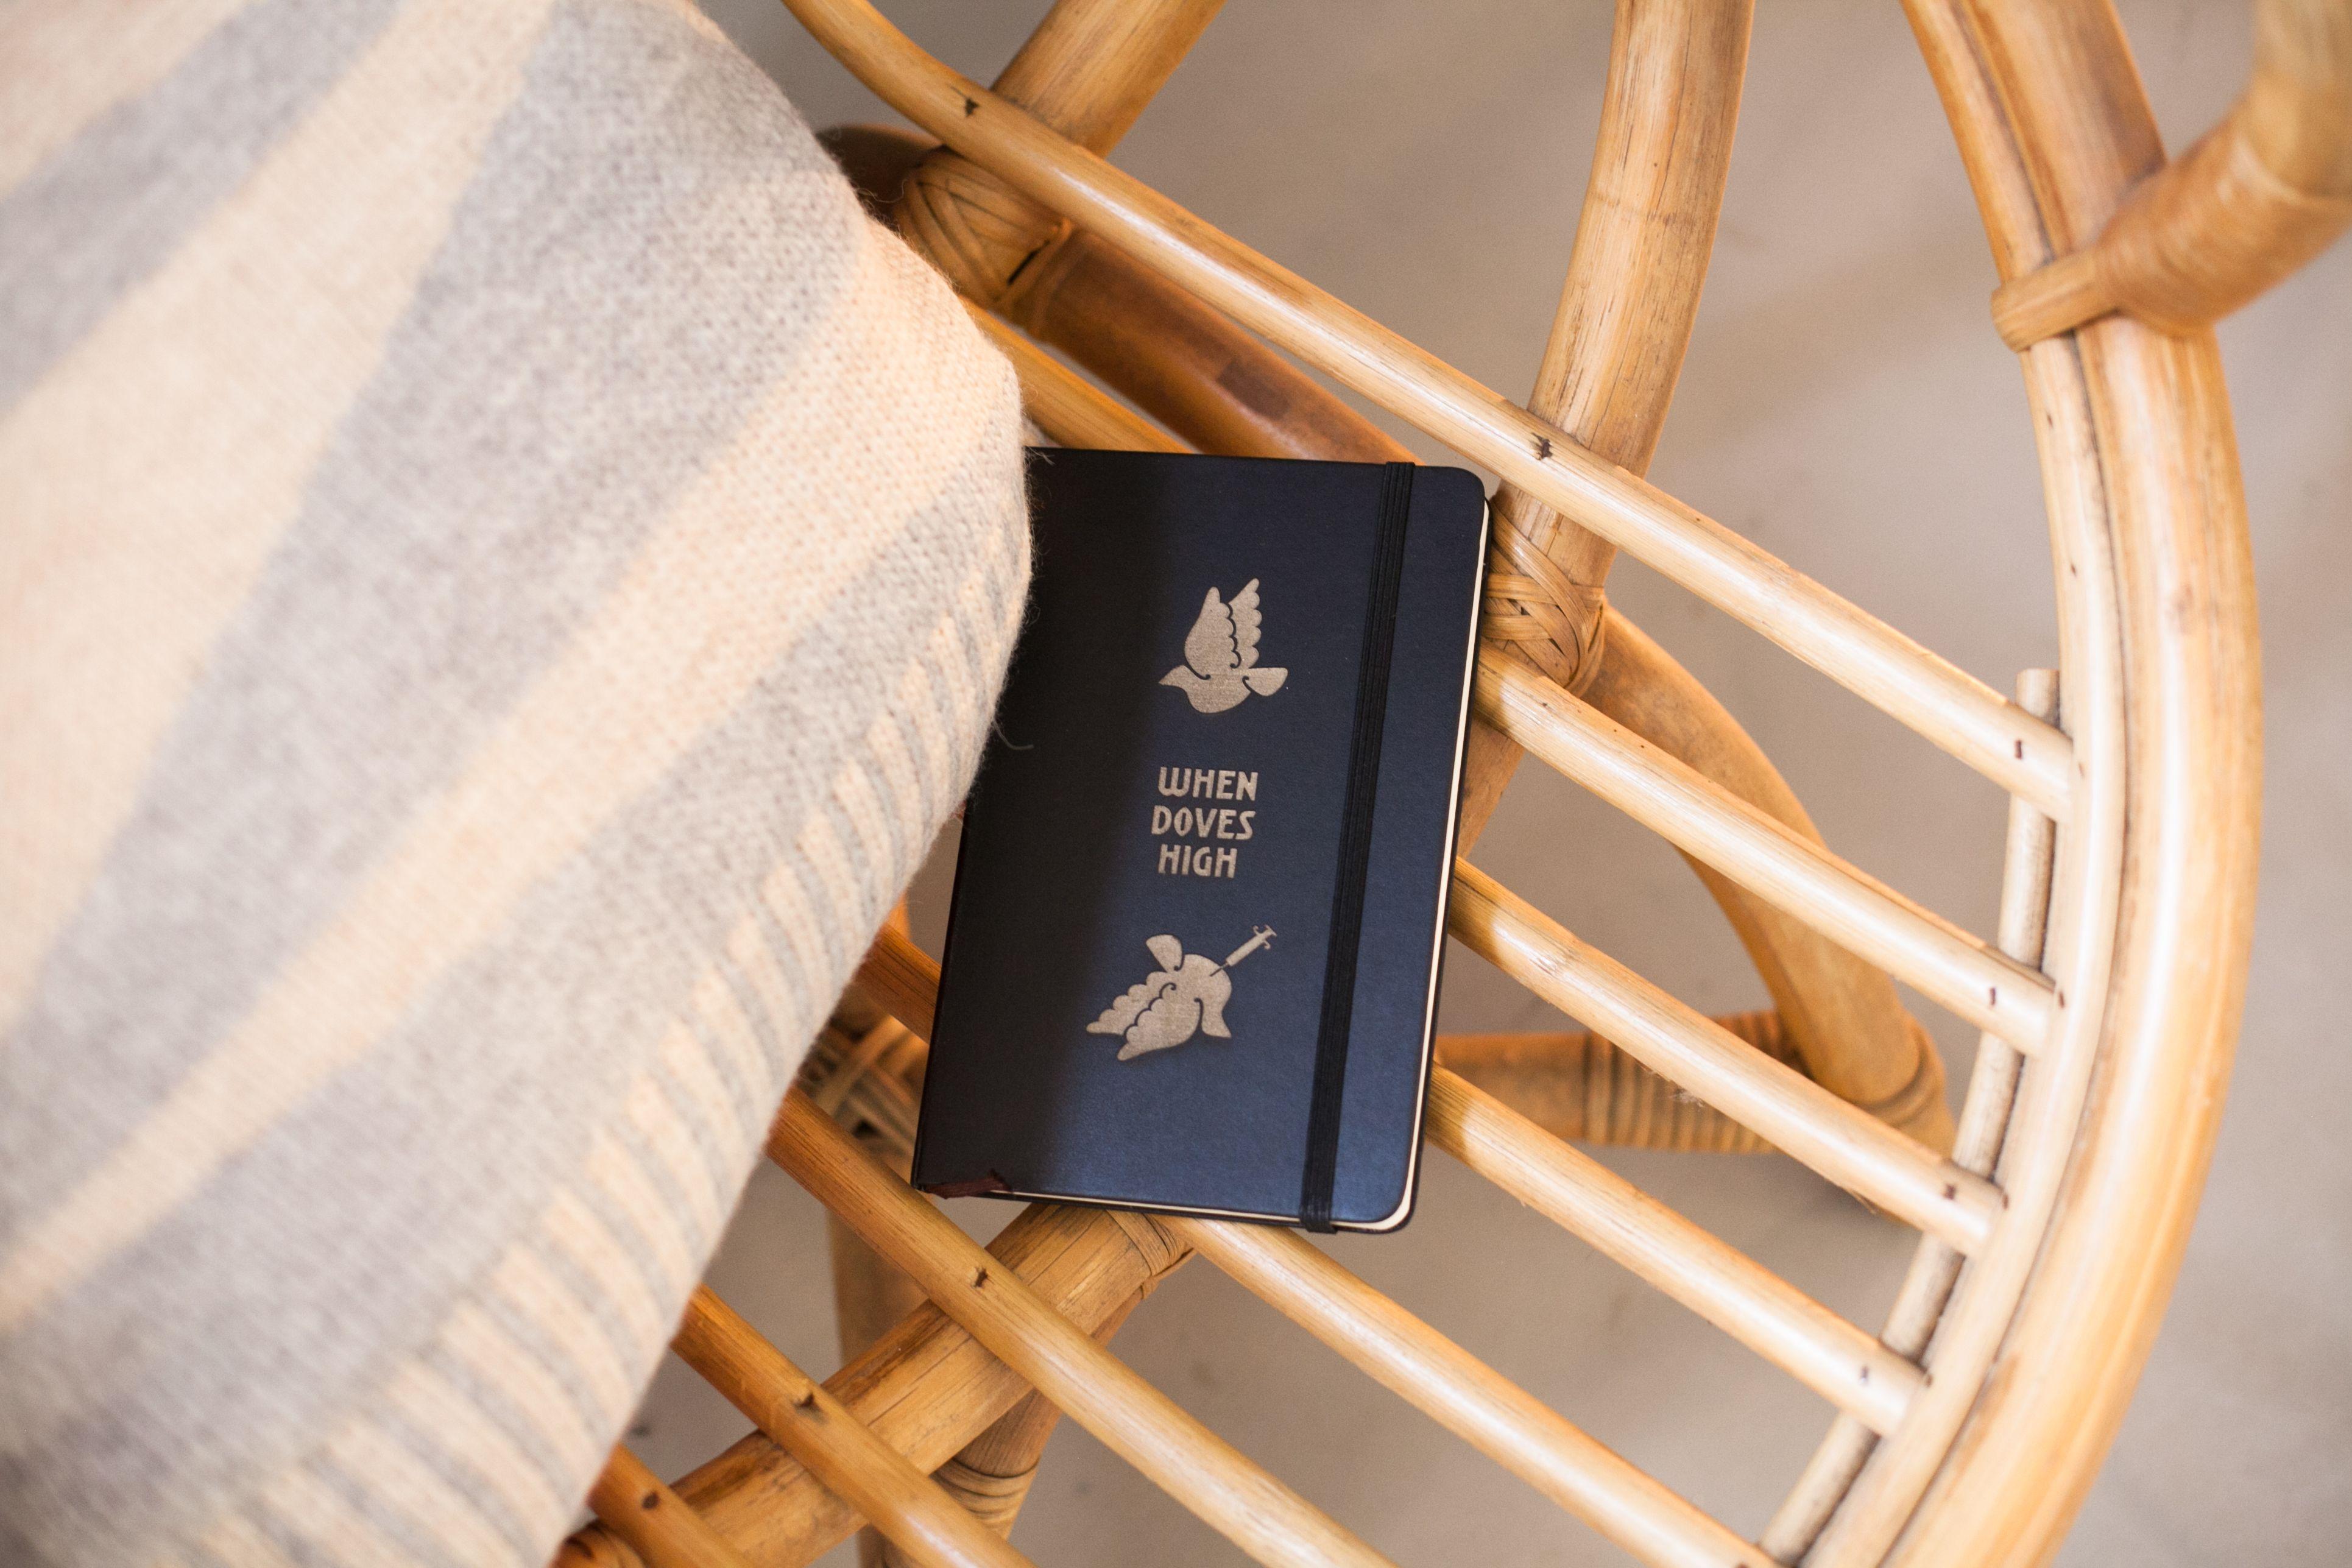 Made @ Uncover Lab | When Doves High | Moleskine ® | Design: Floris | Photo: Eva Leget